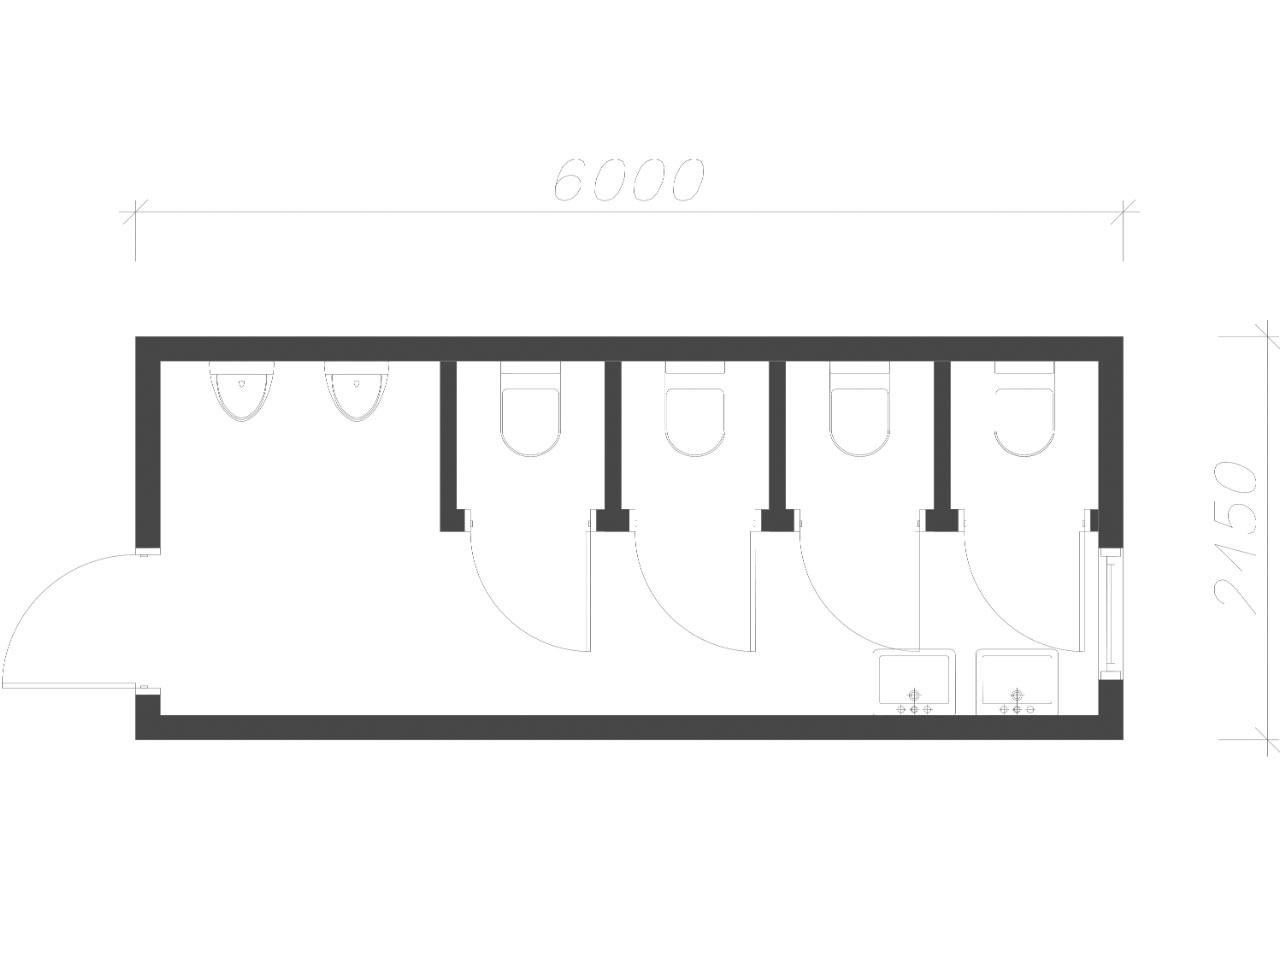 план-схема Блок контейнер туалет СанБК-11